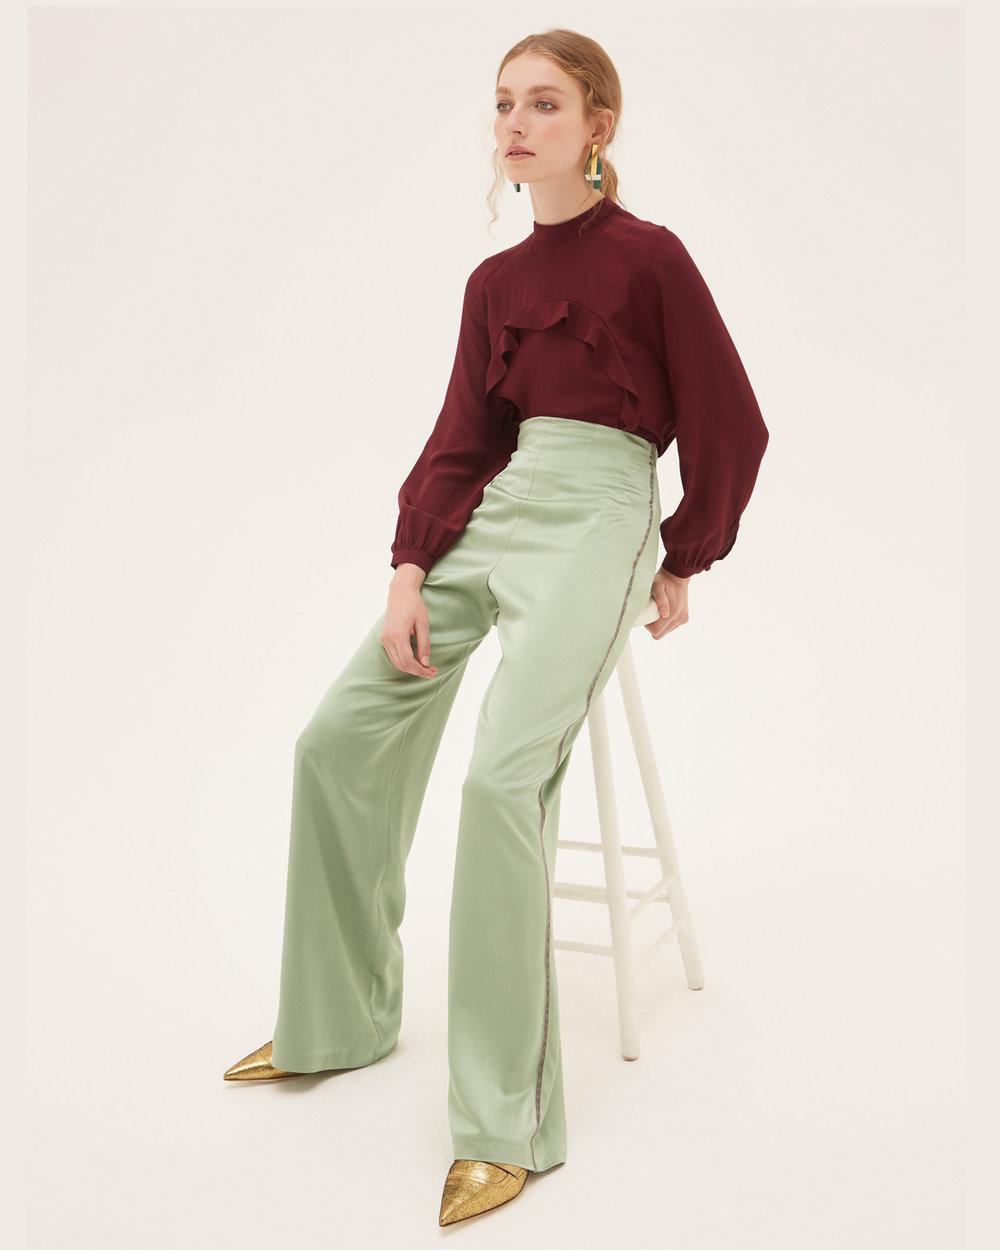 bozena-jankowska-elysian-trousers.jpg